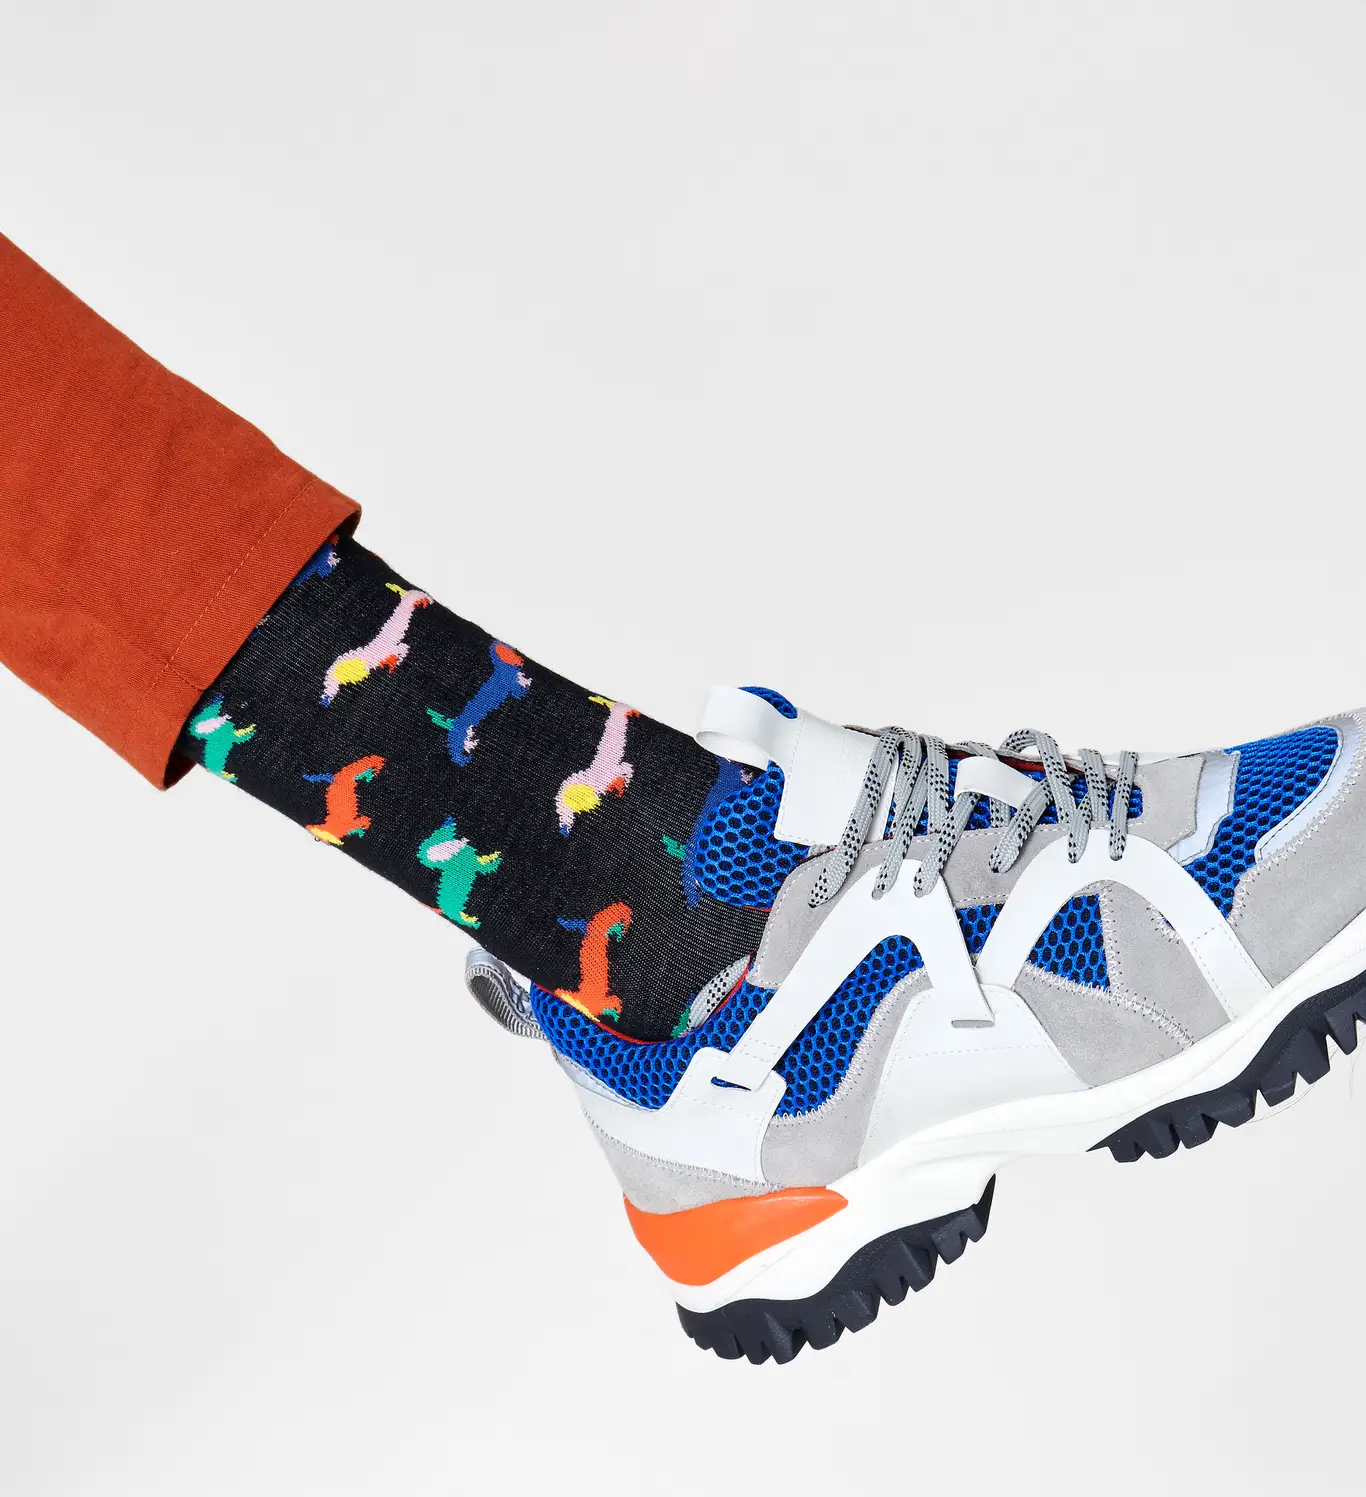 Calzini Puppy love  socks HAPPY SOCKS   WOOL PUPPY LOVE9300